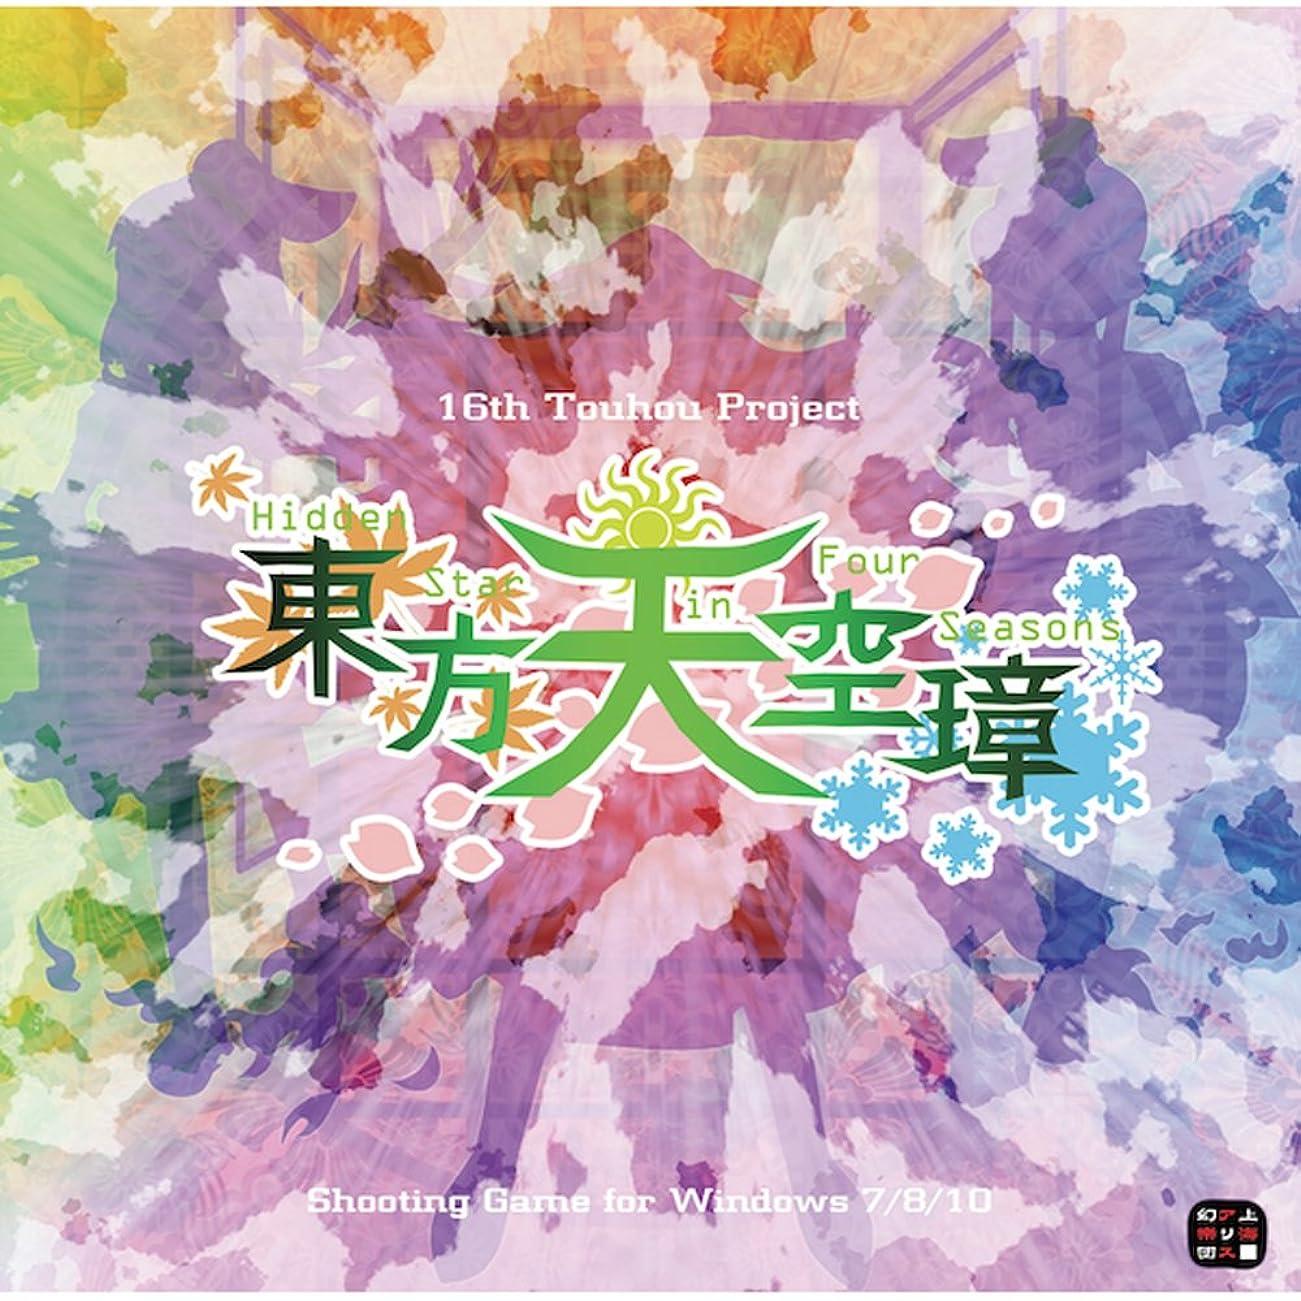 偏差告発者約東方天空璋 ~ Hidden Star in Four Seasons.[東方Project][同人PCソフト]